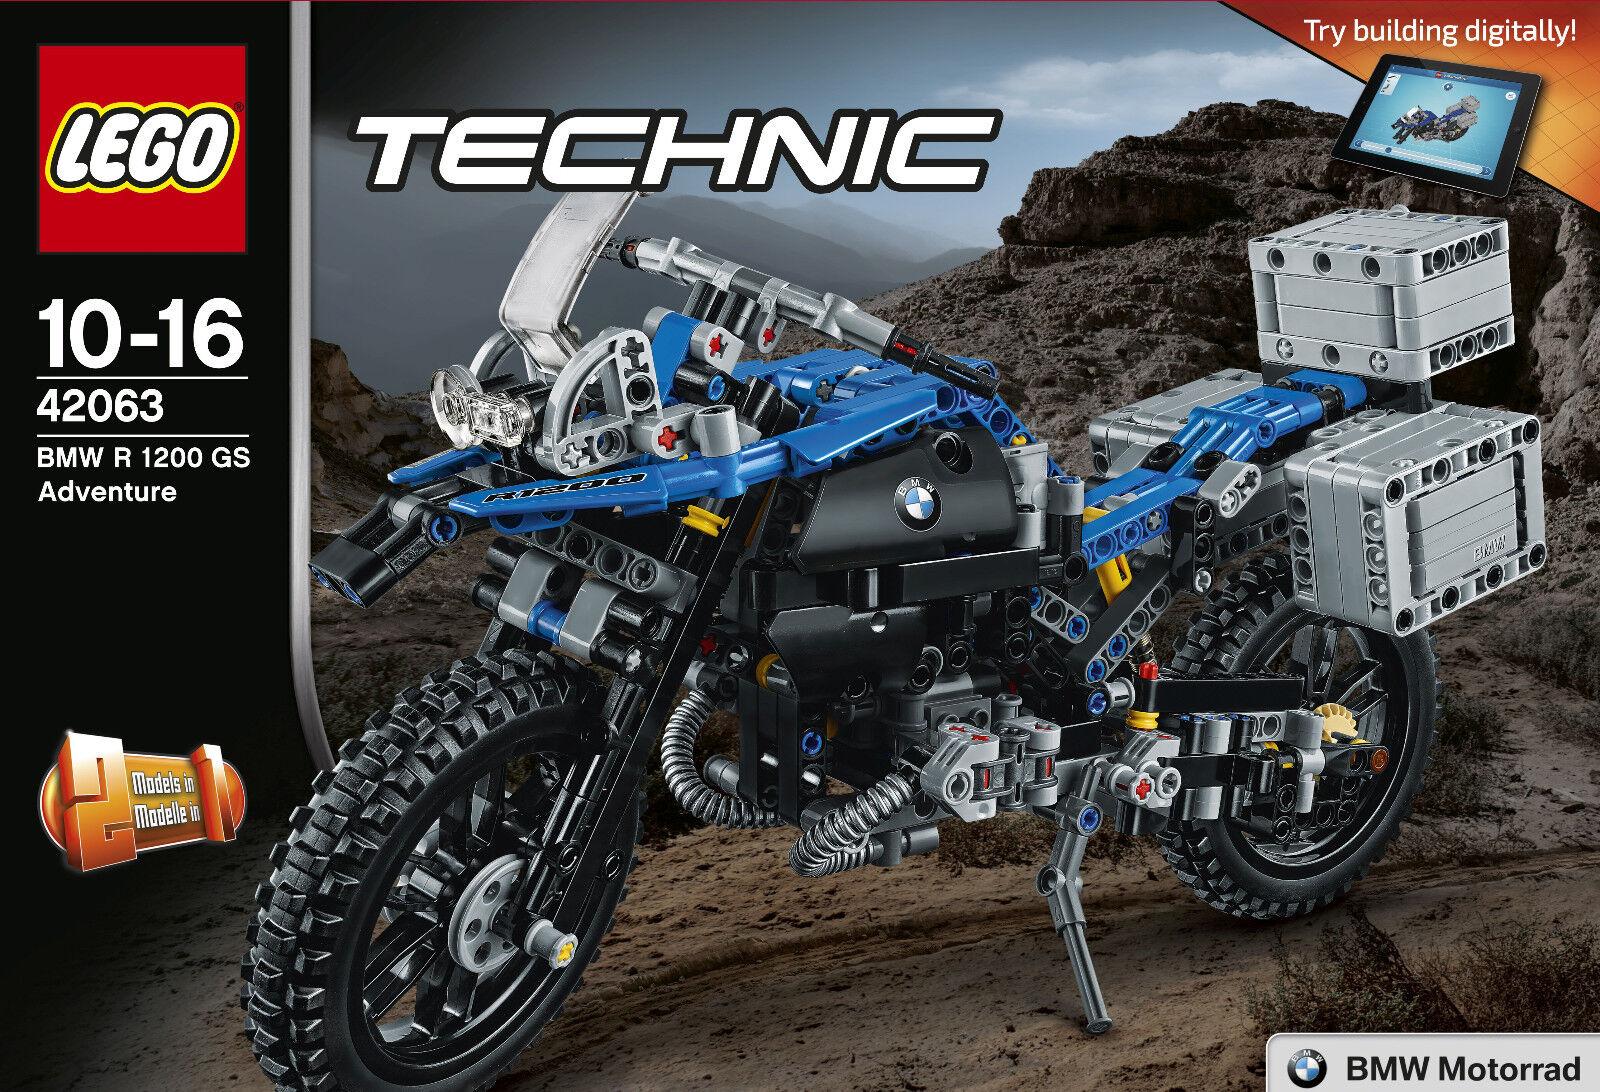 LEGO® TECHNIC 42063 - BMW R 1200 GS ADVENTURE, MOTORRAD, NEU/OVP